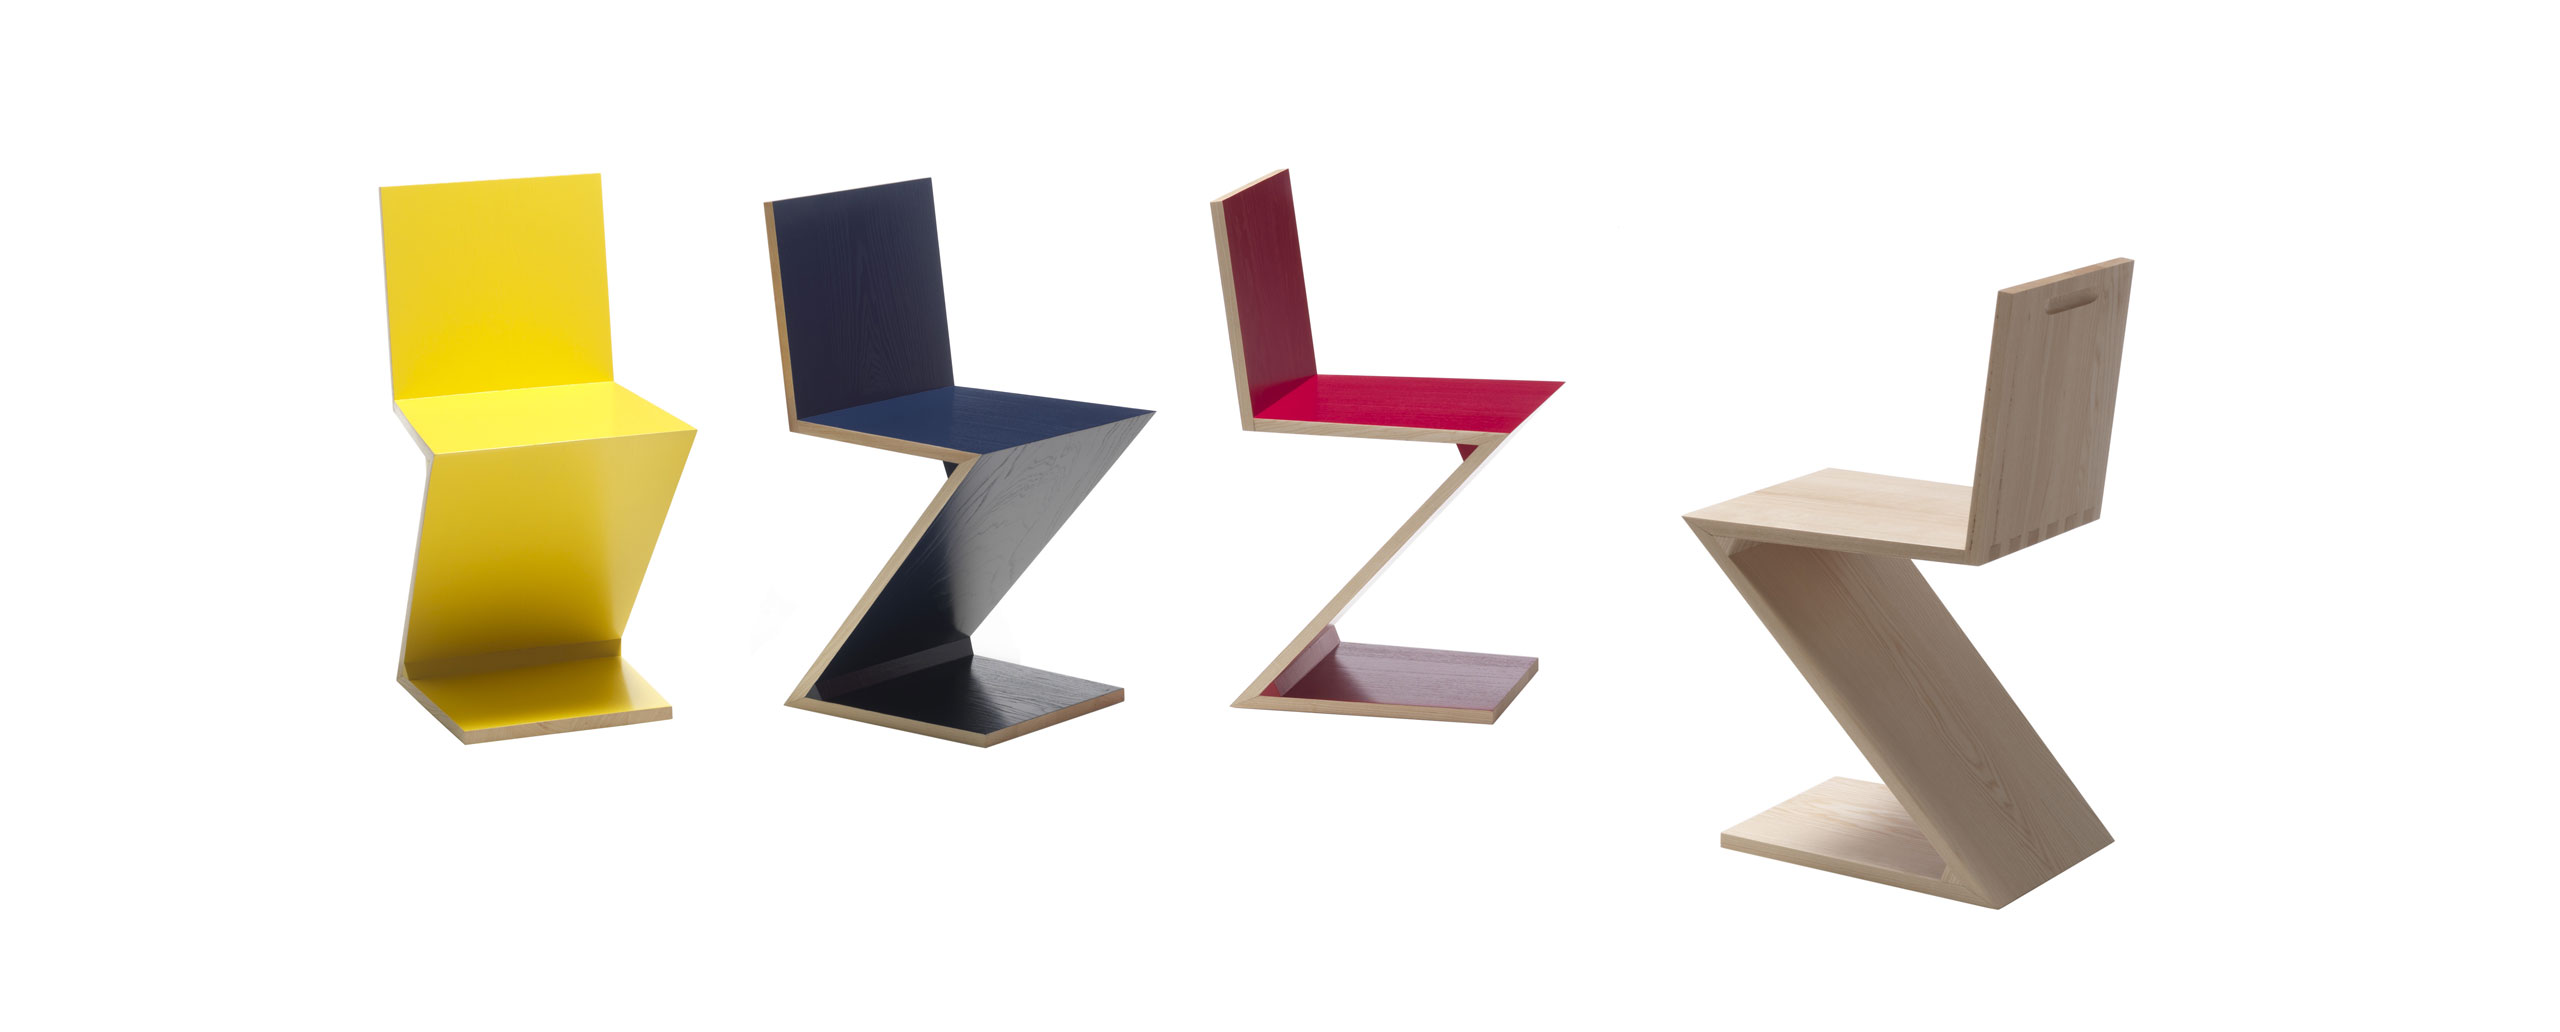 Inspiration bauhaus gerrit thomas rietveld zig zag for Design stuhl zig zag